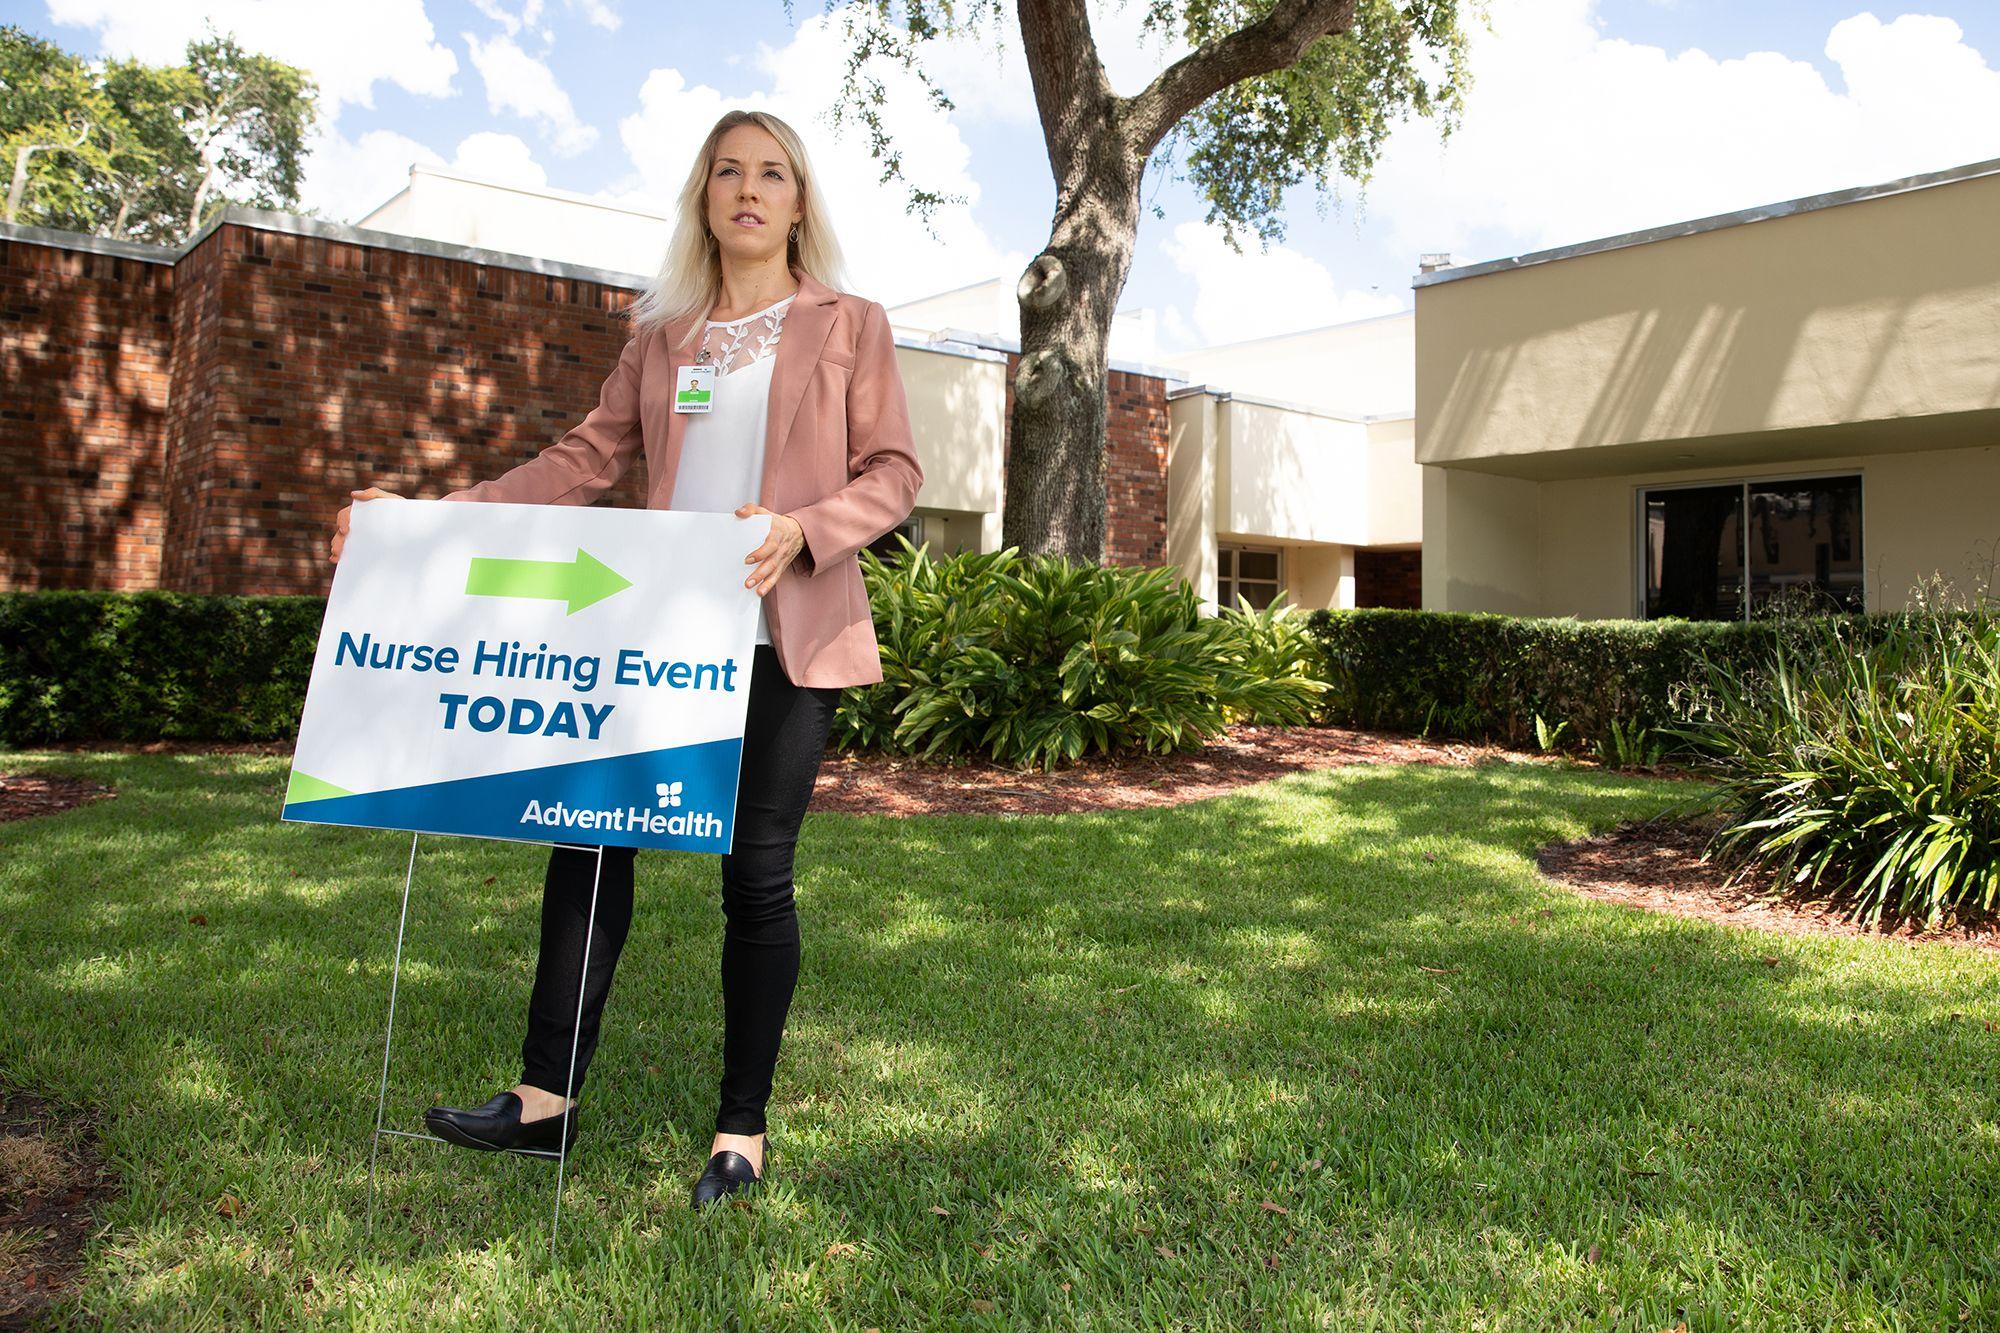 As part of her internship, Nina Steigerwald '20 sets up signs to promote AdventHealth's employee wellness program.